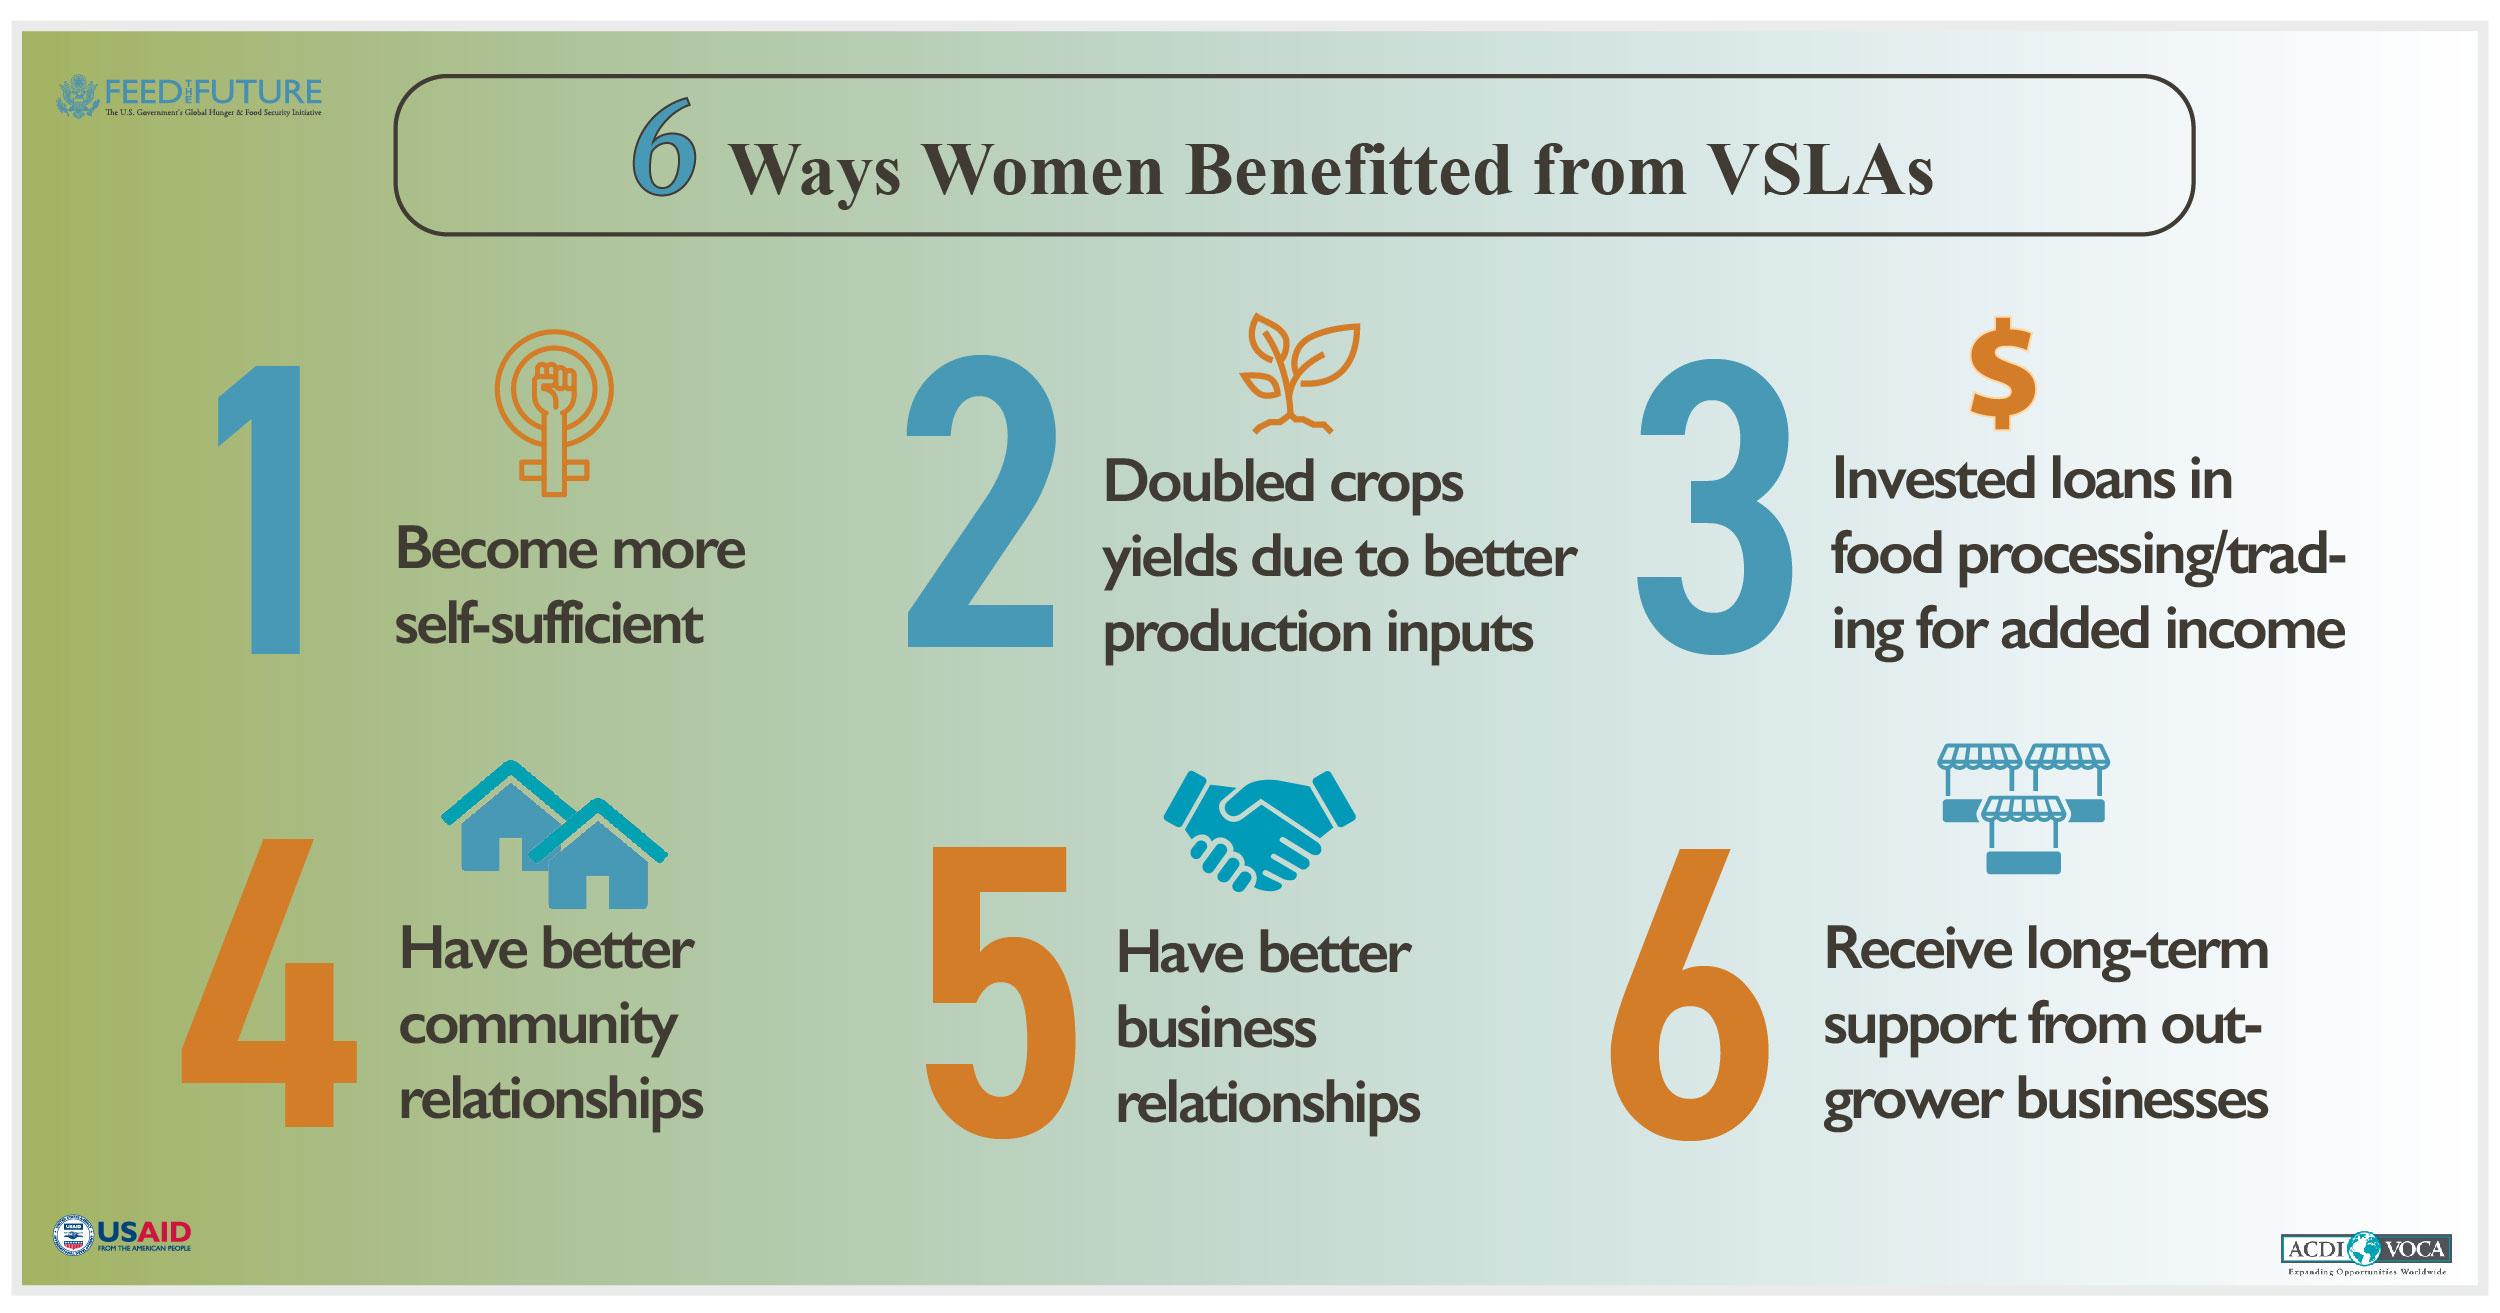 Six ways women benefit from VSLAs